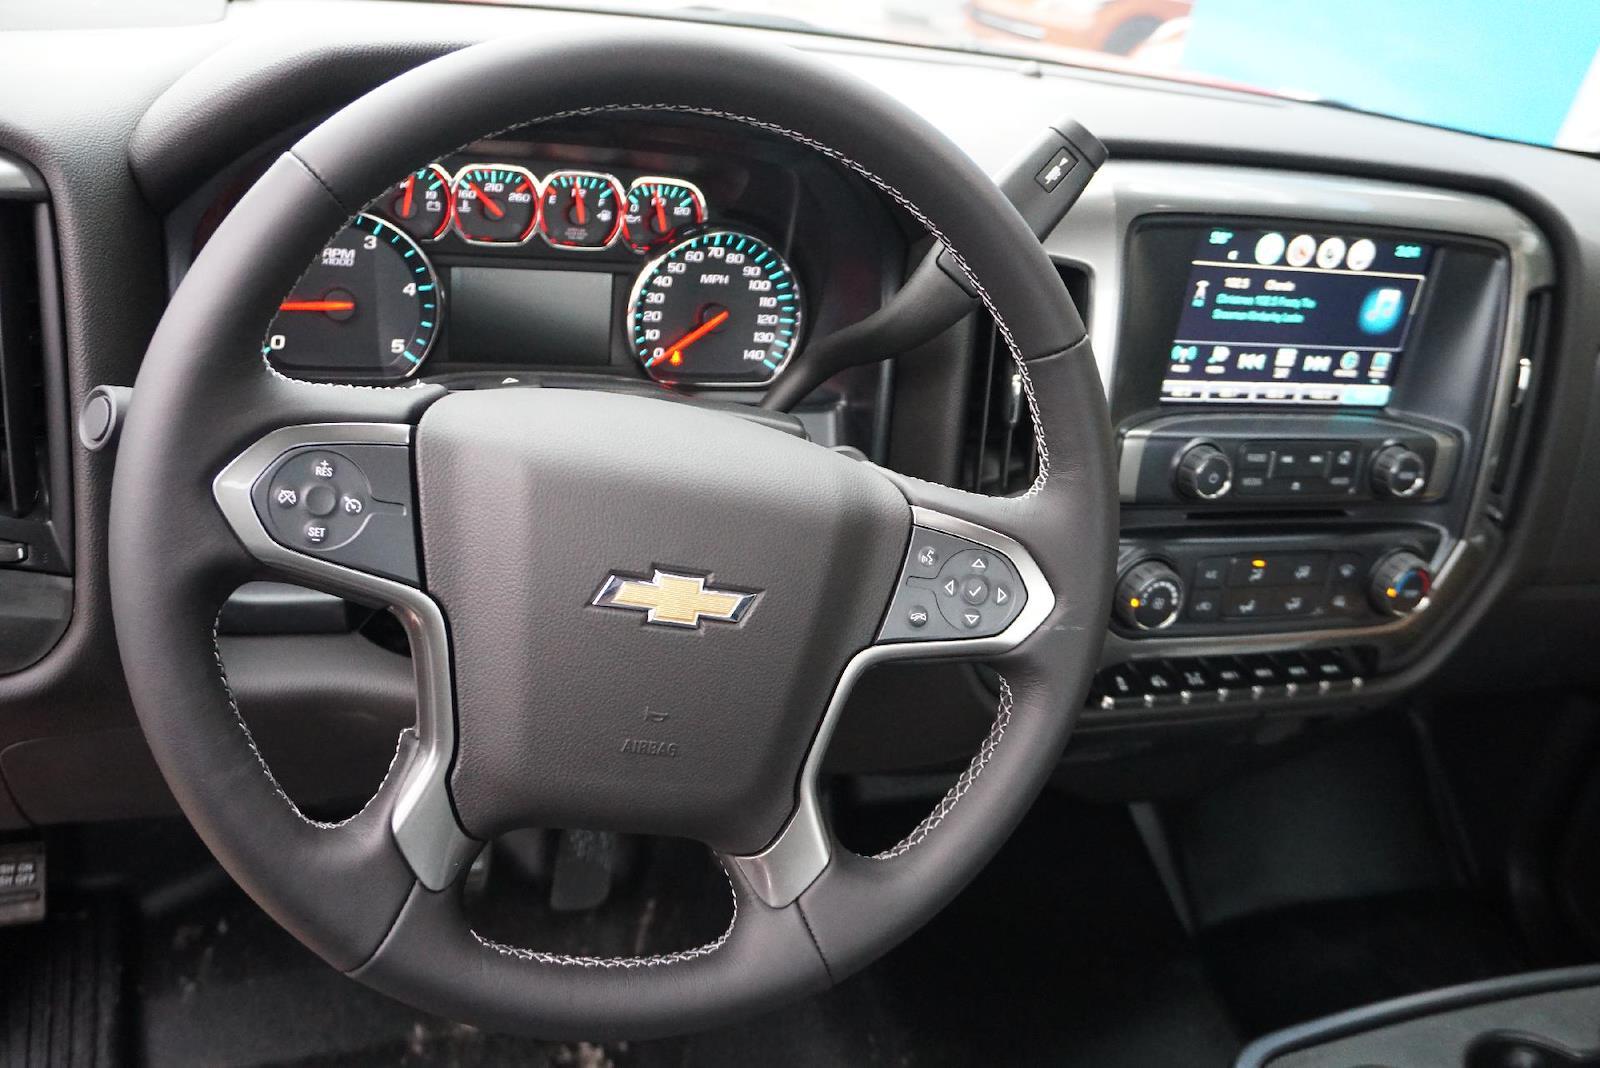 2019 Chevrolet Silverado 5500 Regular Cab DRW 4x2, Rollback Body #91052 - photo 16